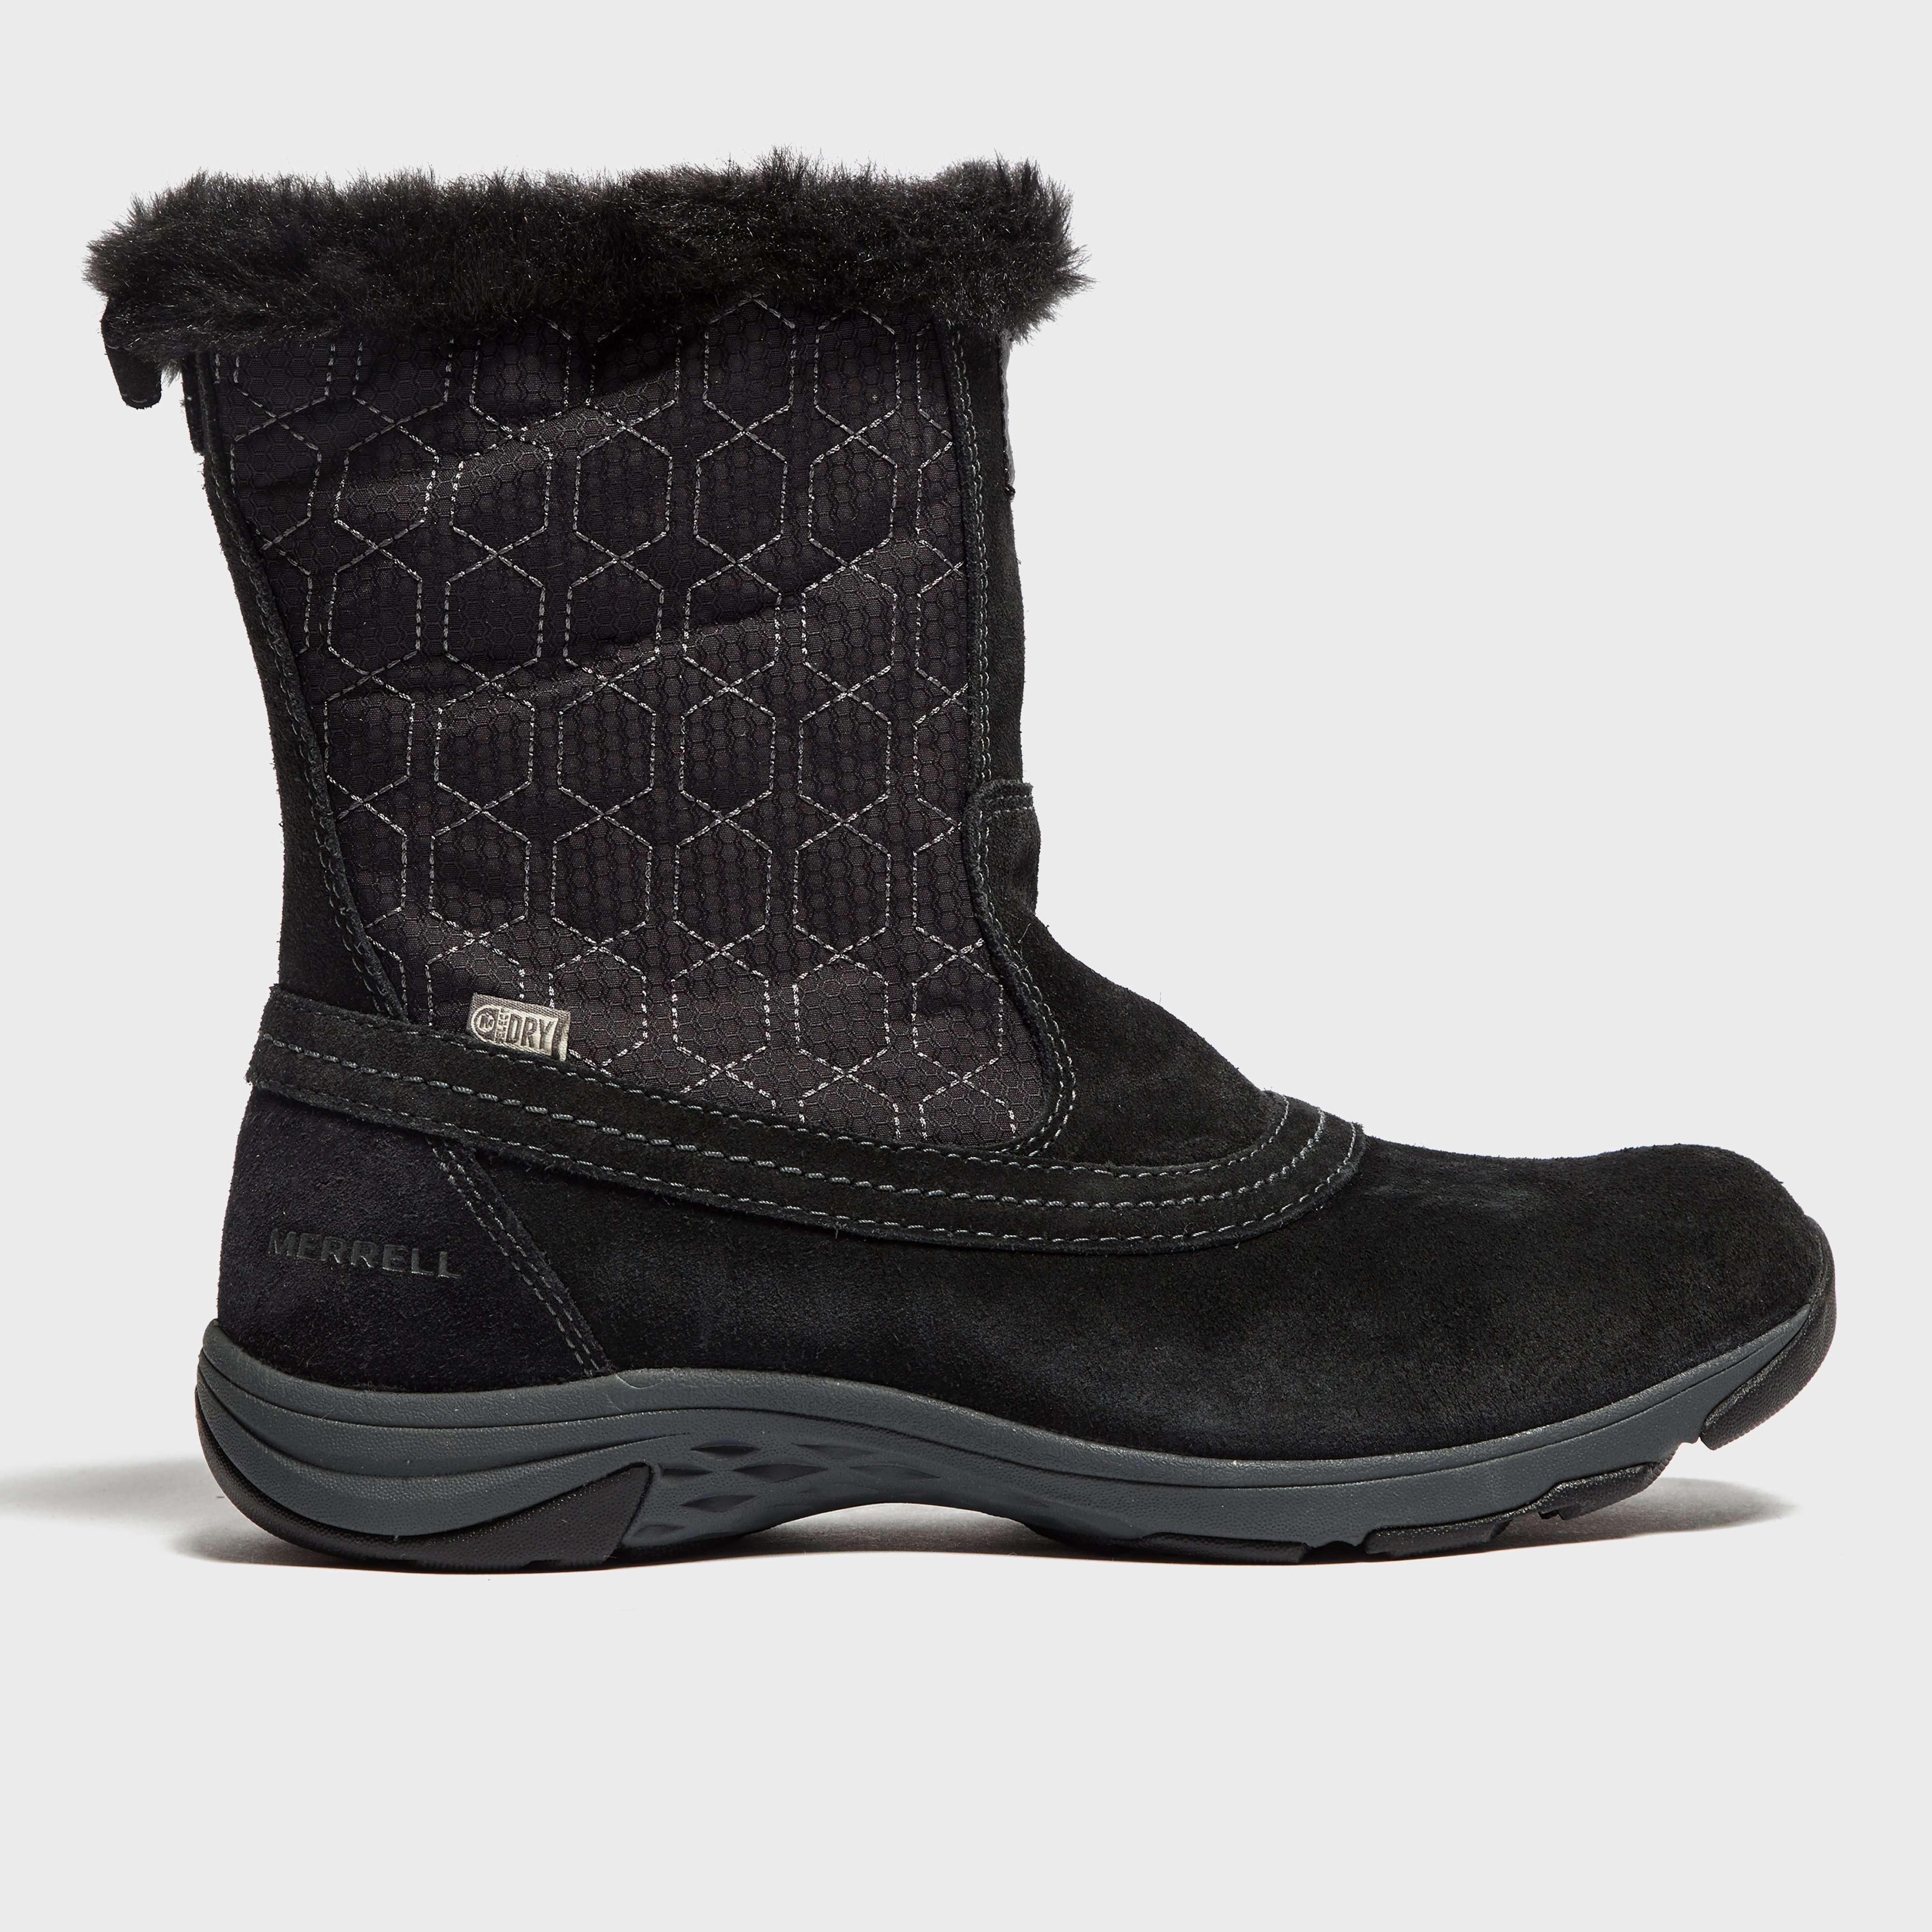 MERRELL Women's Ryeland Tall Snow Boots